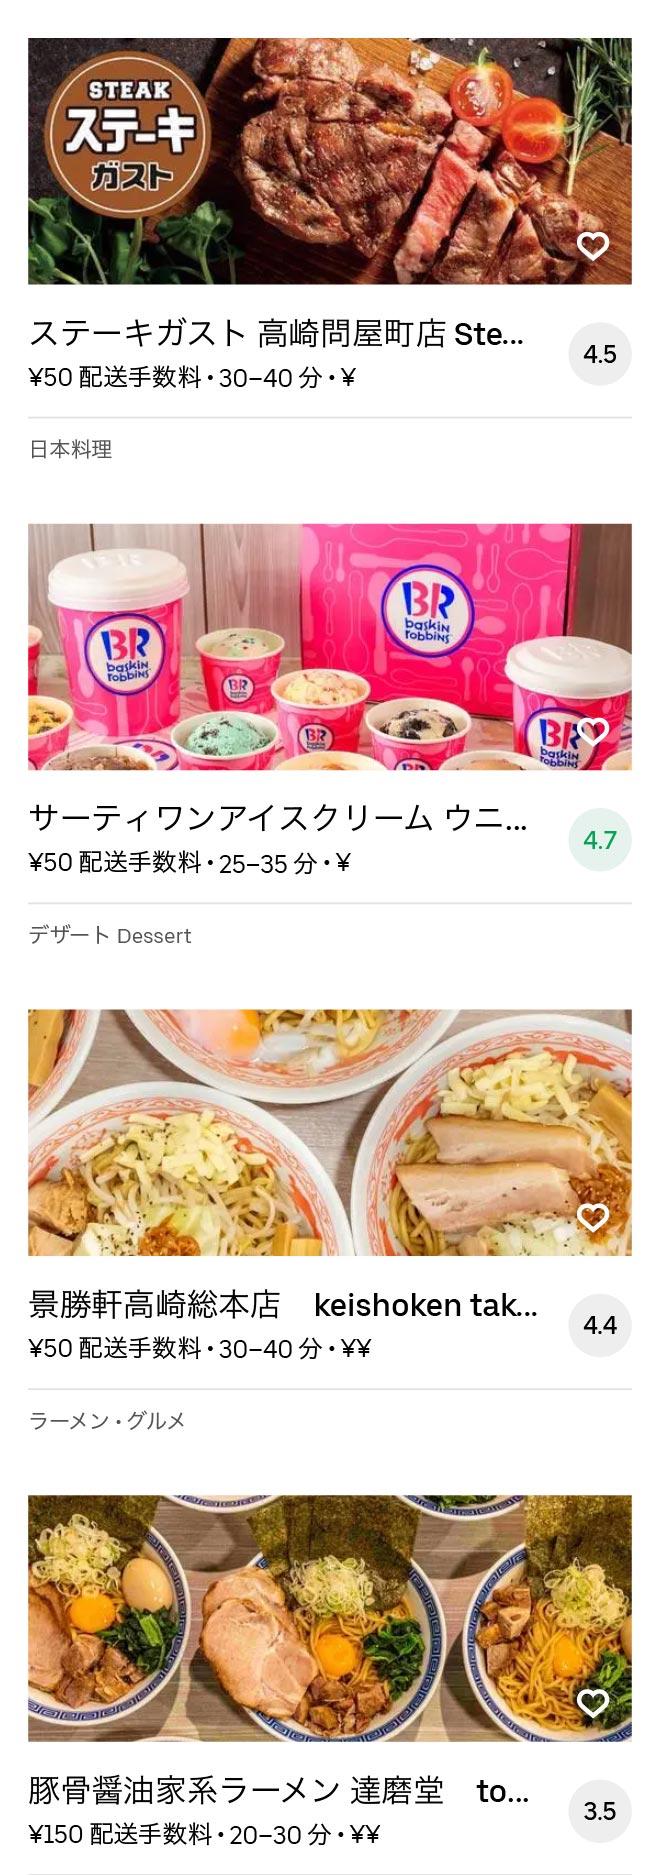 Tonyamachi menu 2010 05